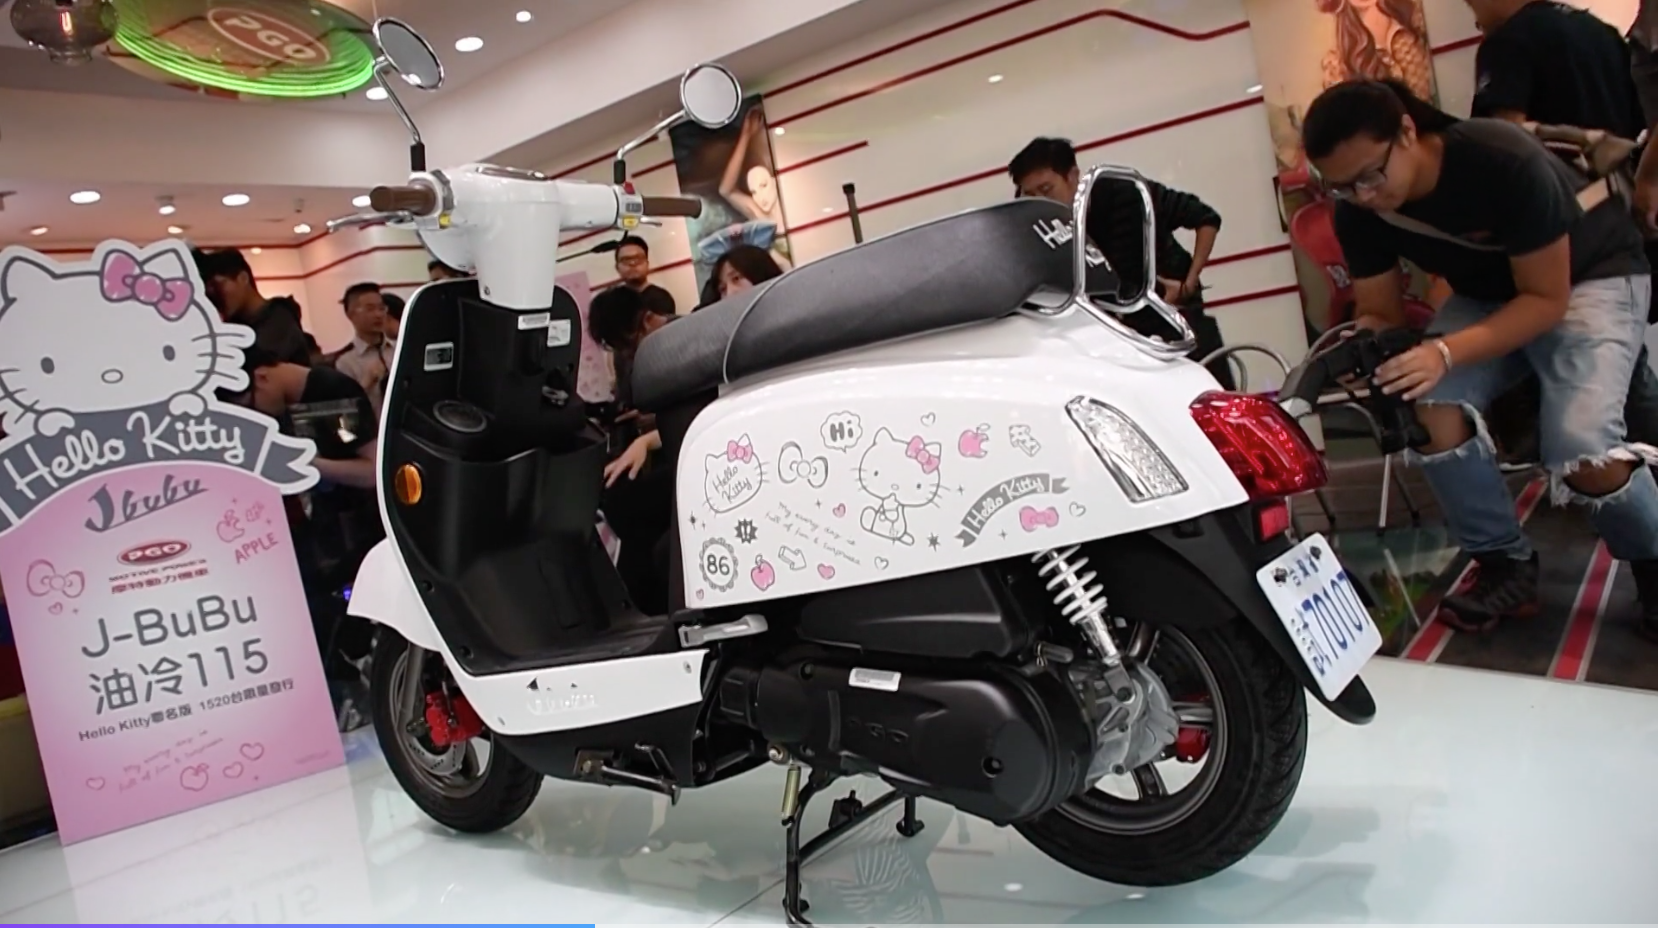 【HD影片】PGO J-BuBu Hello Kitty & 蛋黃哥 聯名版|超萌登場